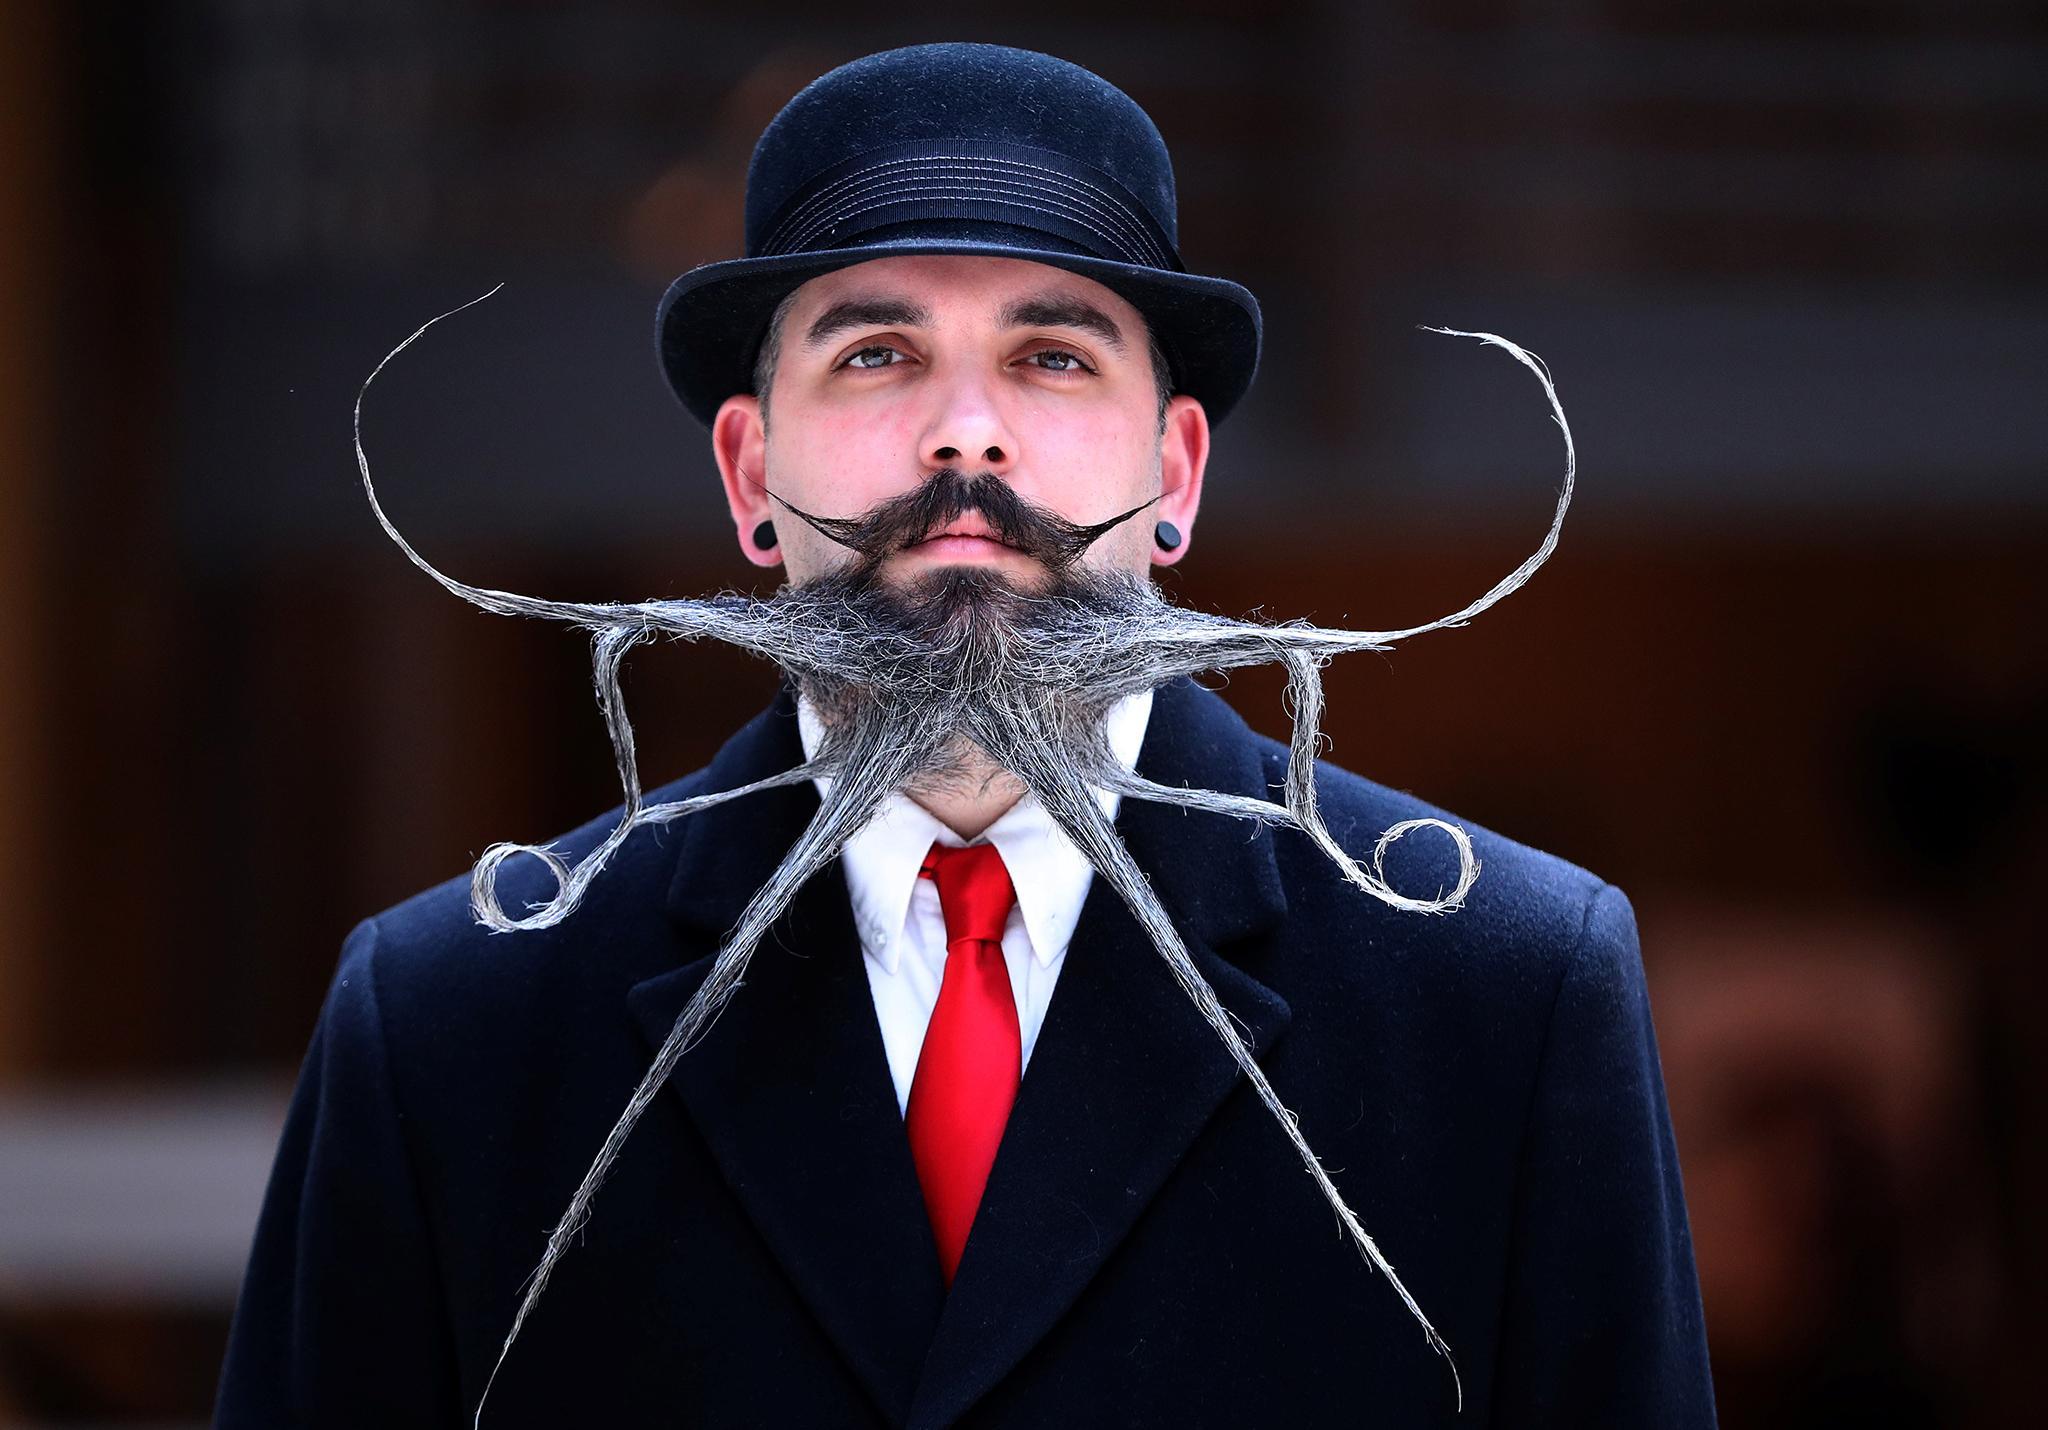 Marvelous Worlds Best Beards Compete In Antwerp The Independent Schematic Wiring Diagrams Amerangerunnerswayorg